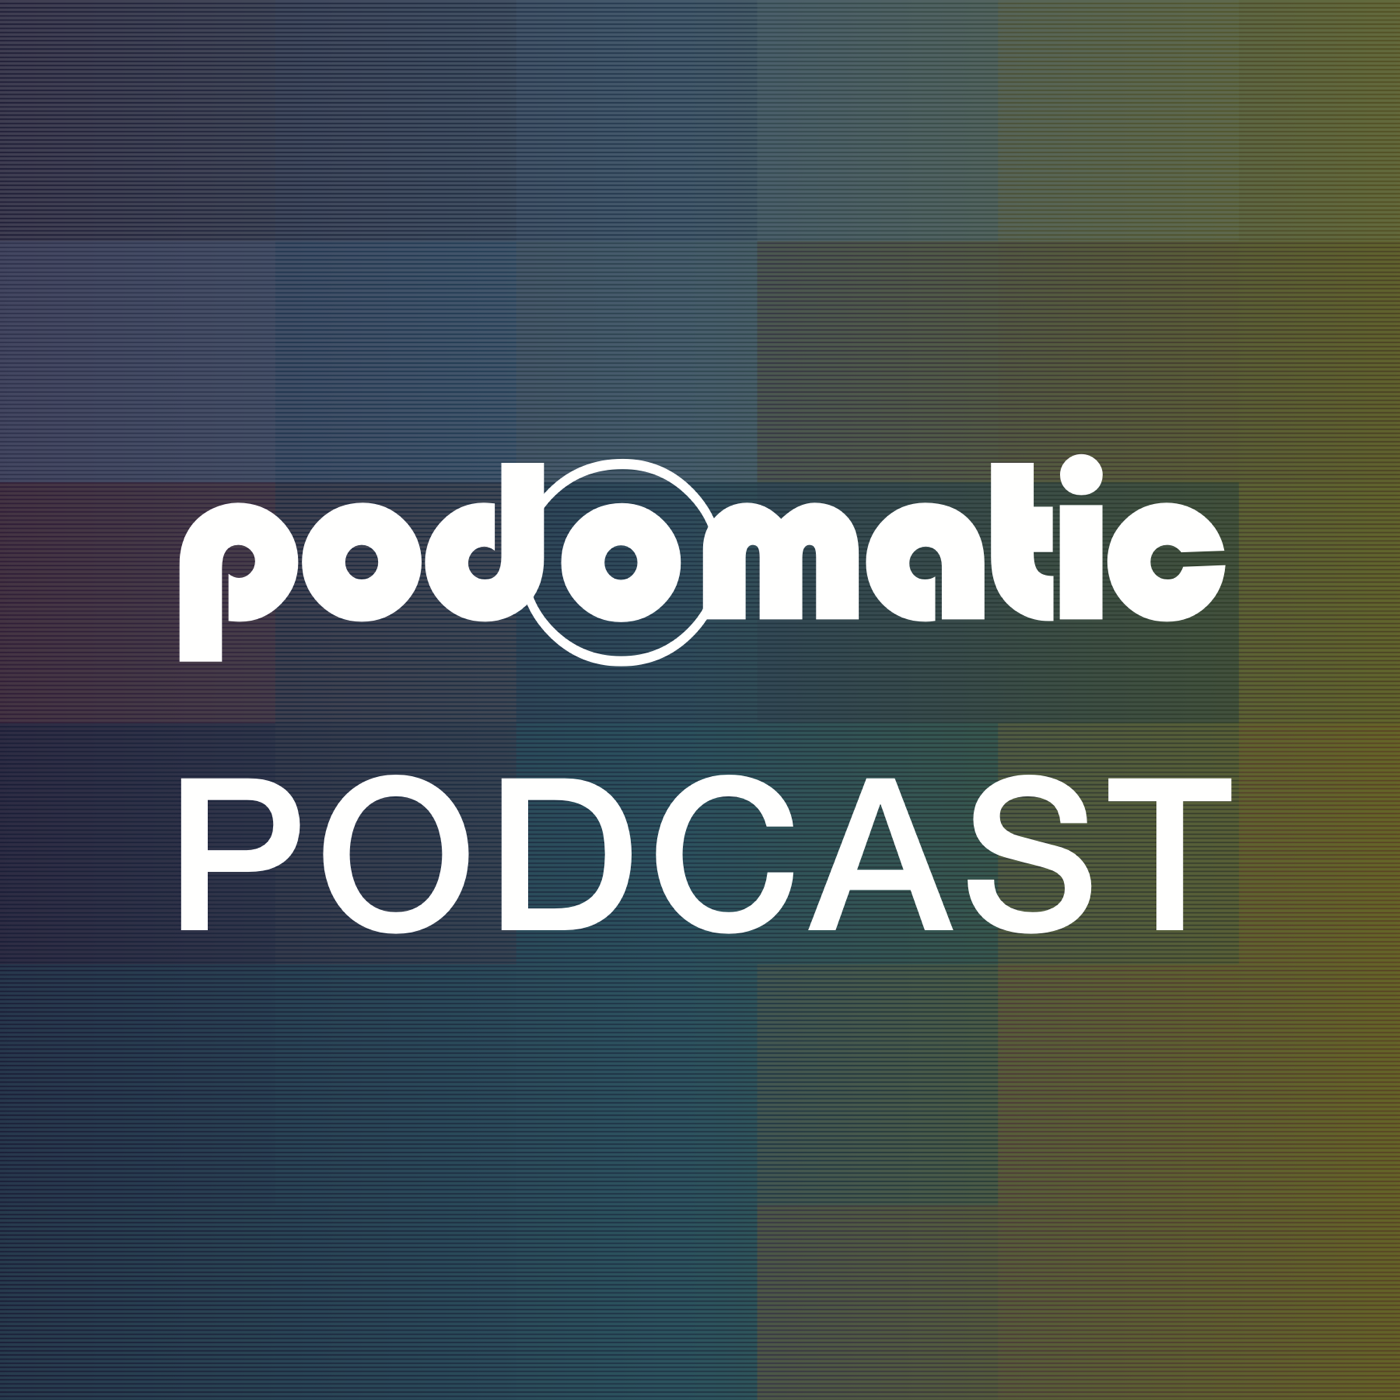 raul noriega's Podcast